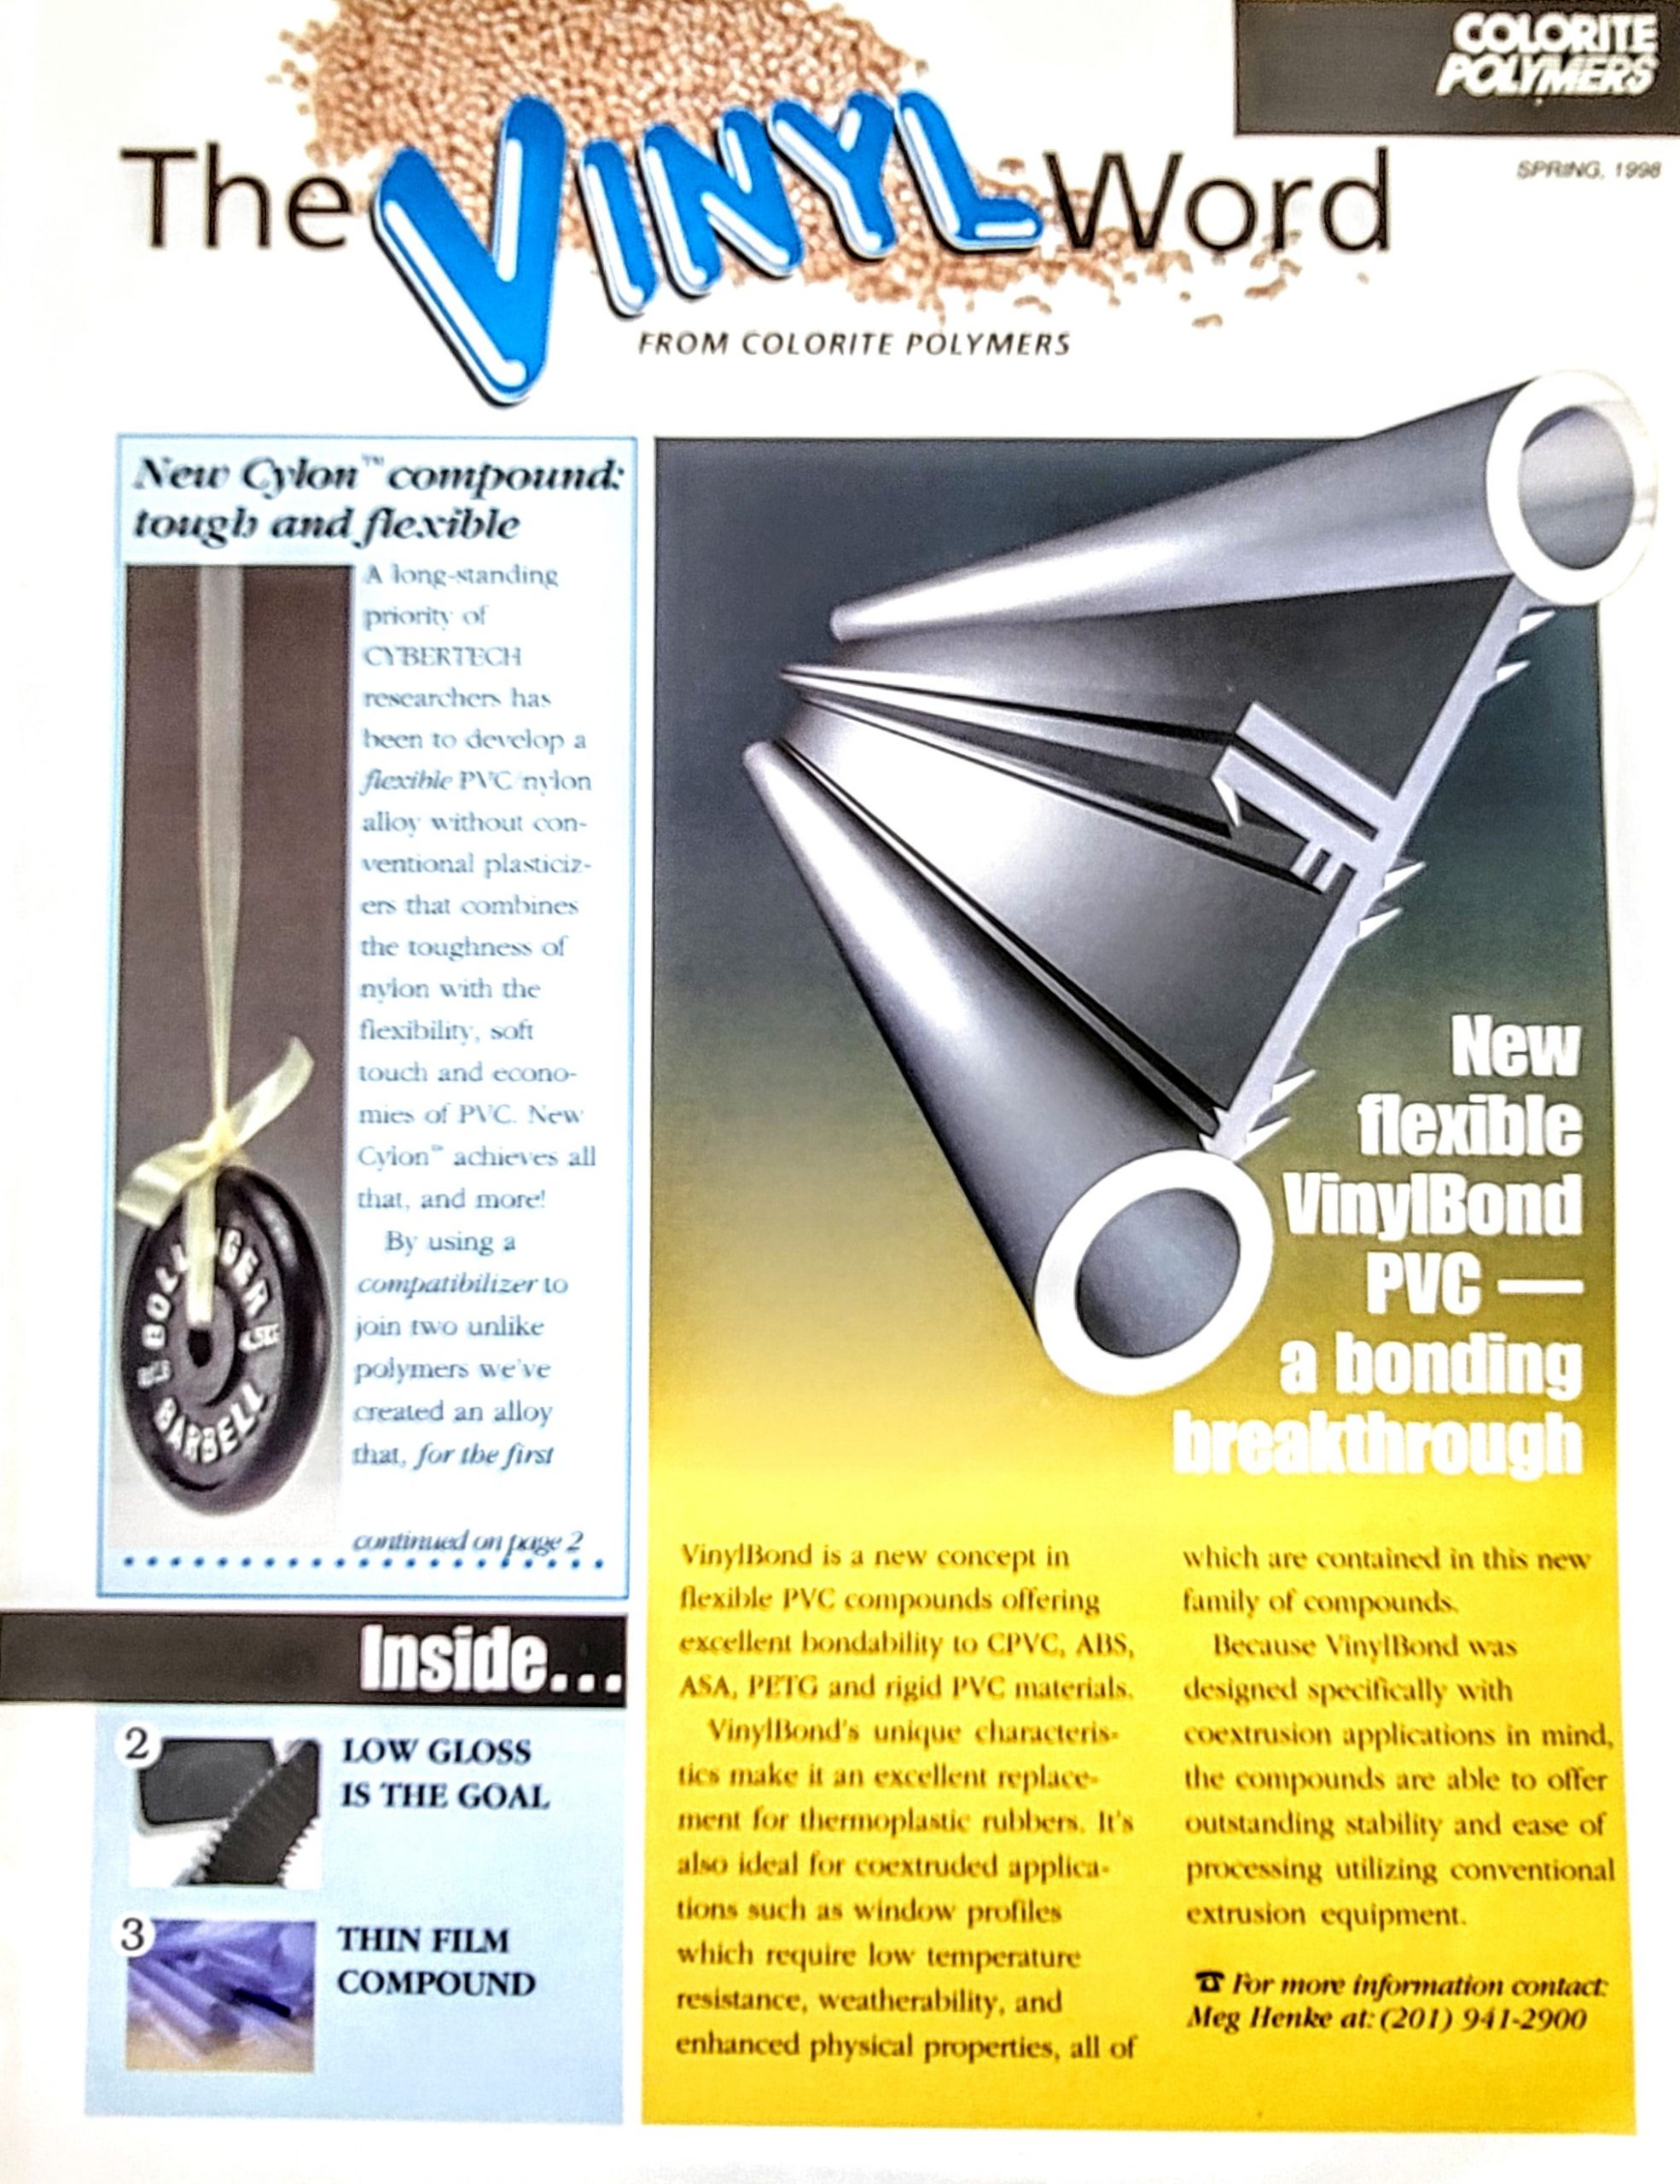 colorite_the vinyl word newsletter_9